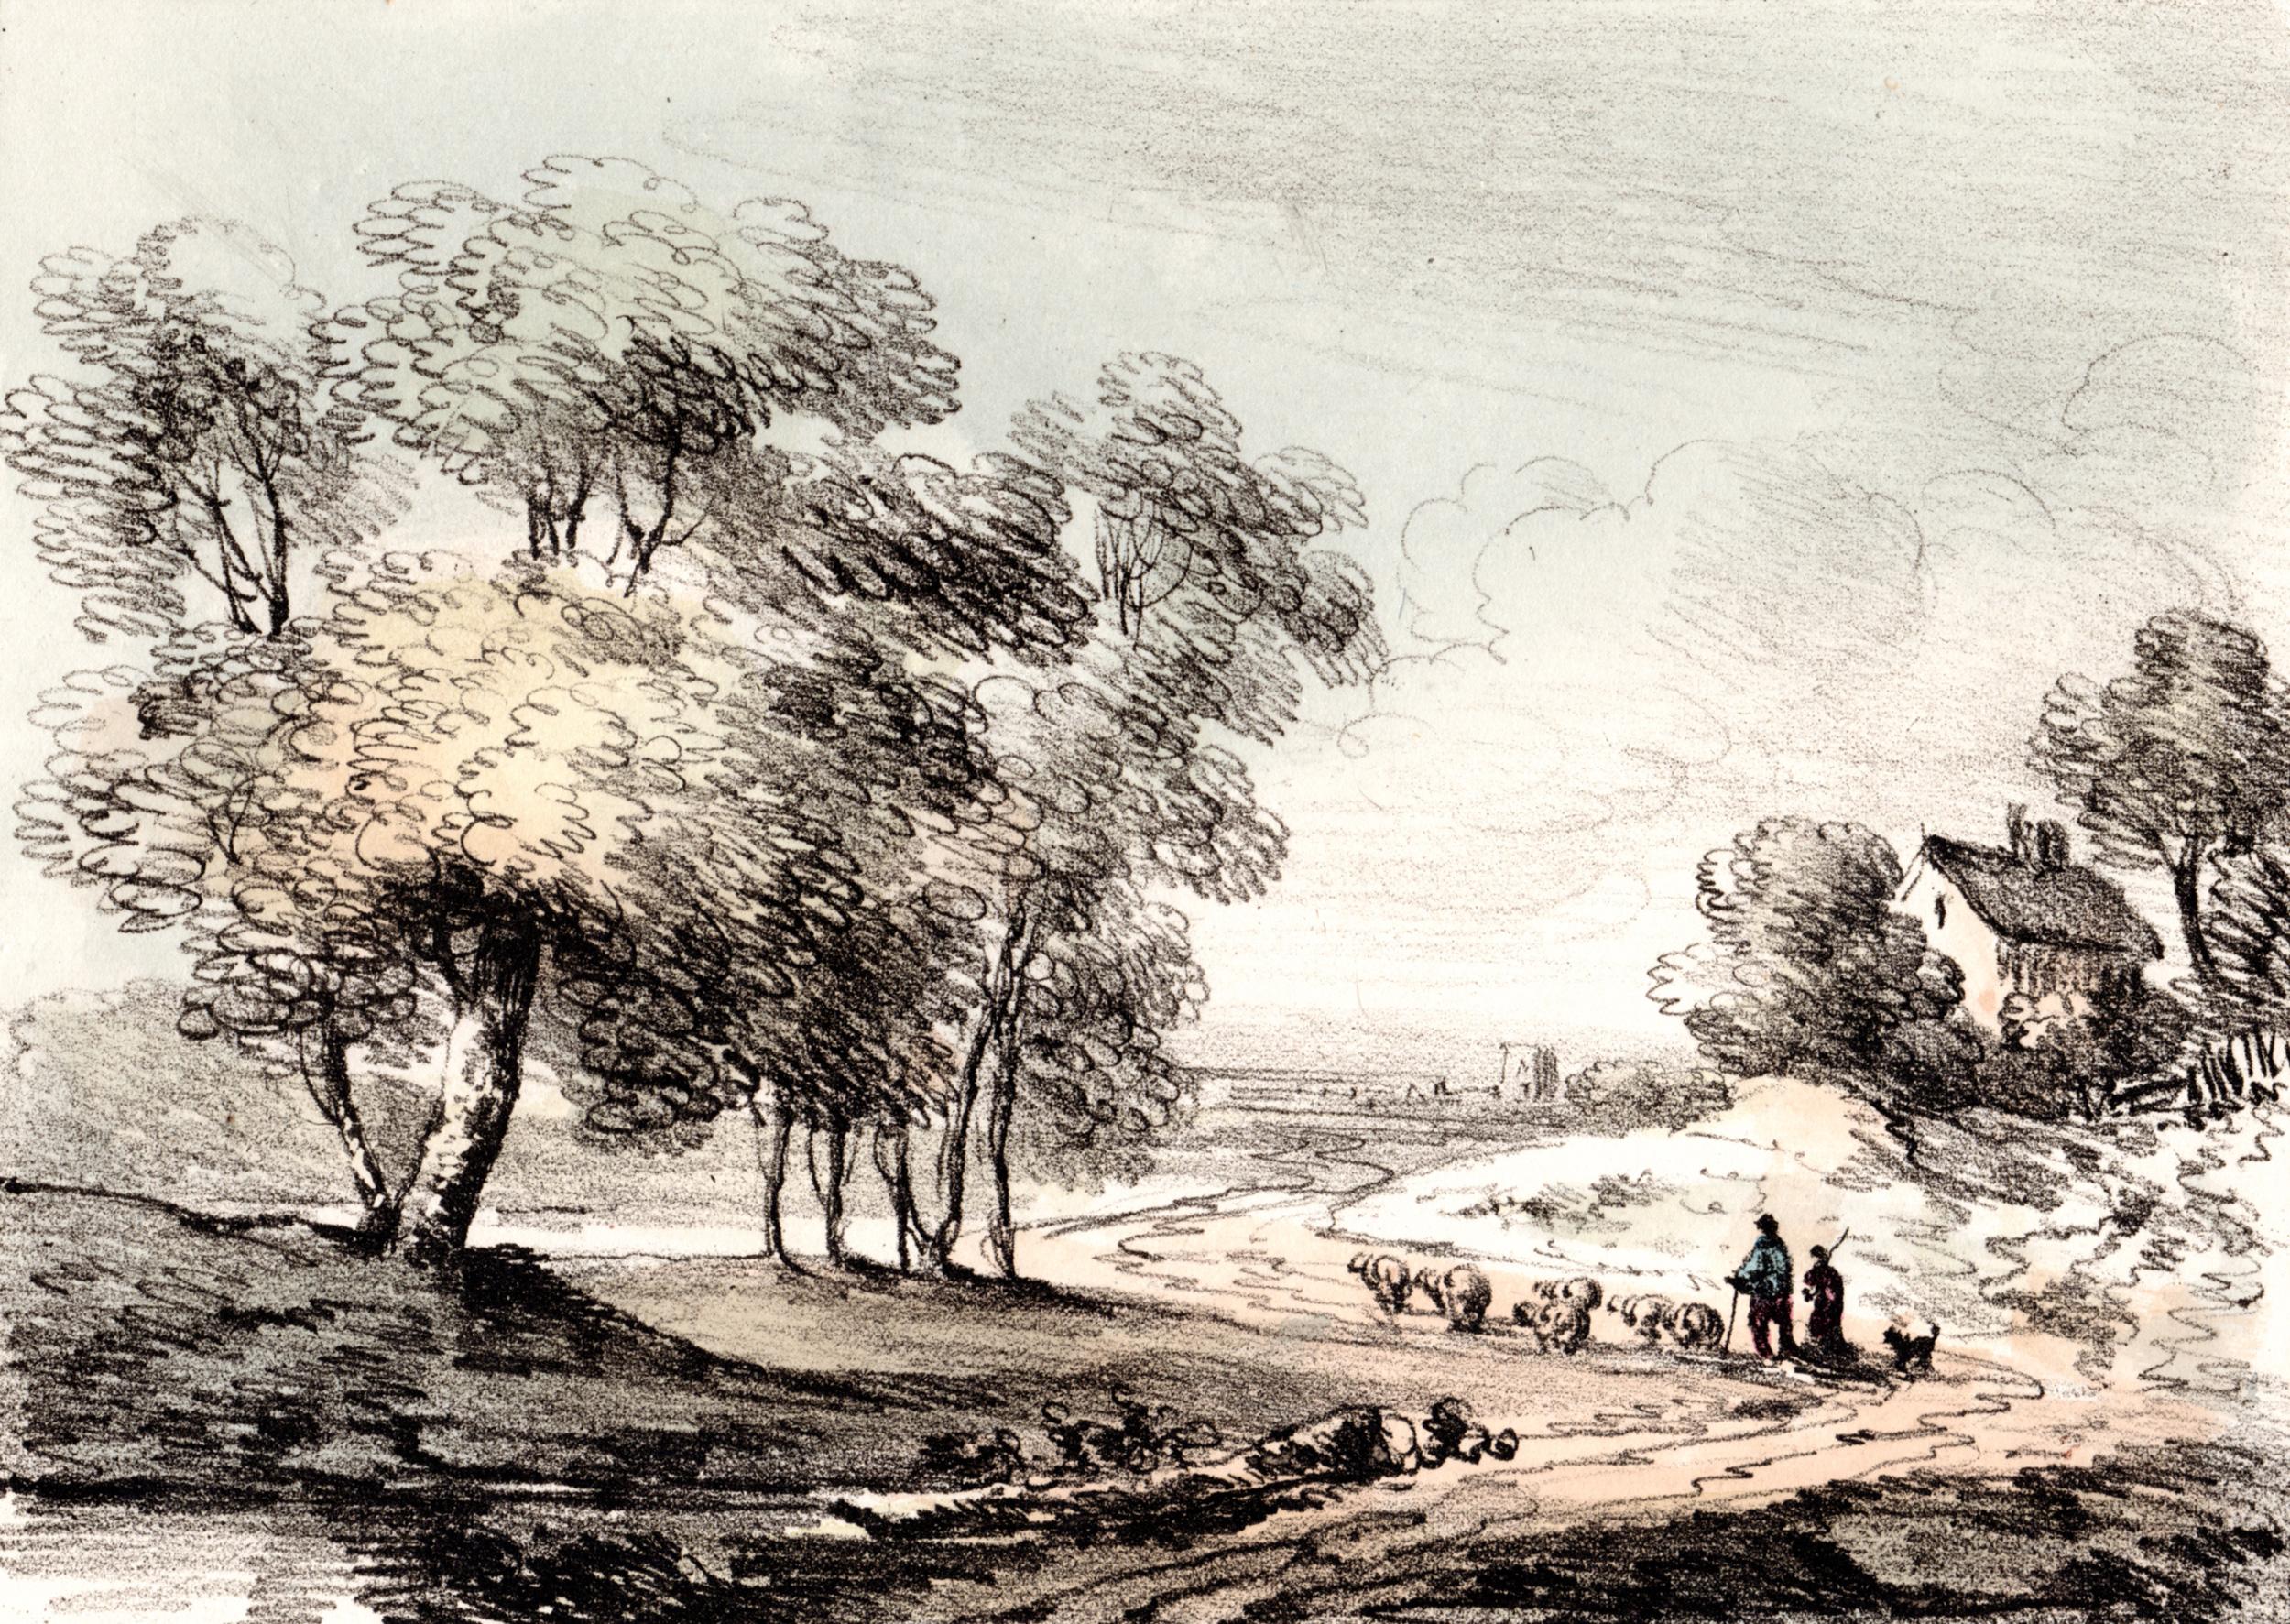 Gainsborough, Thomas / English Scenery